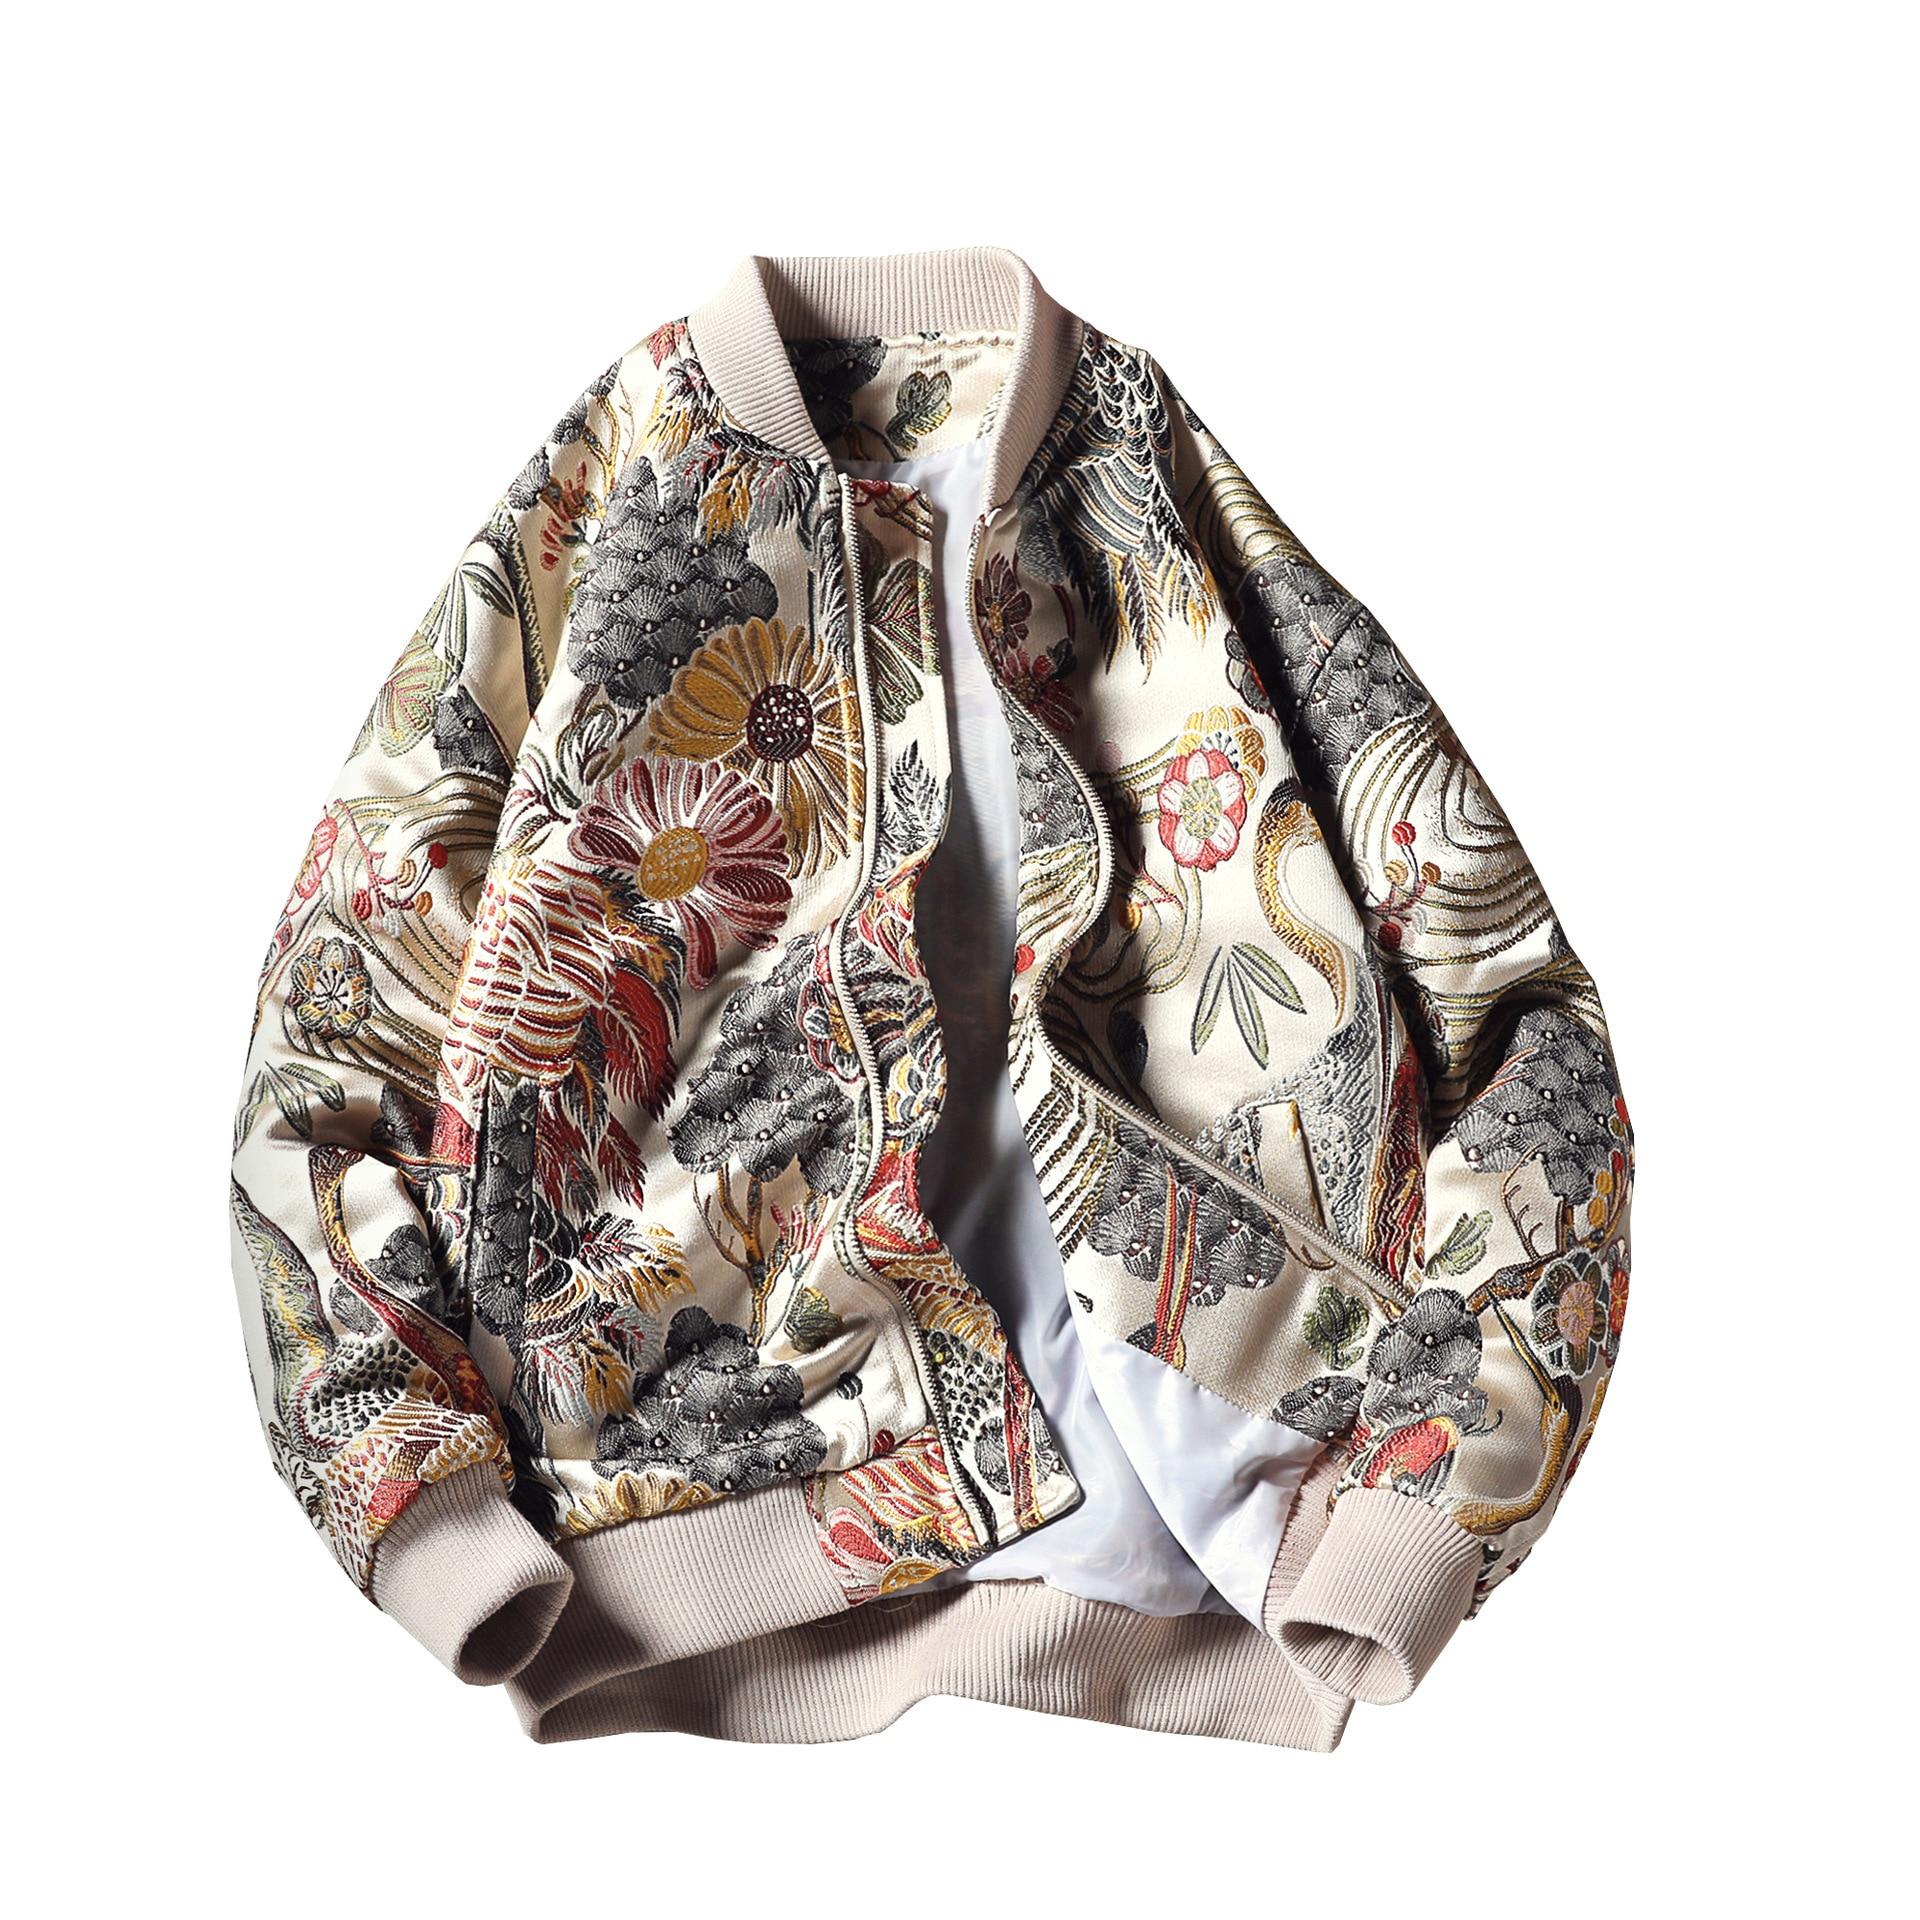 Original Brand Japanese Embroidery Men Jacket Coat Man Hip Hop Streetwear Men Jacket Coat Bomber Jacket Men Clothes 2019 New in Jackets from Men 39 s Clothing